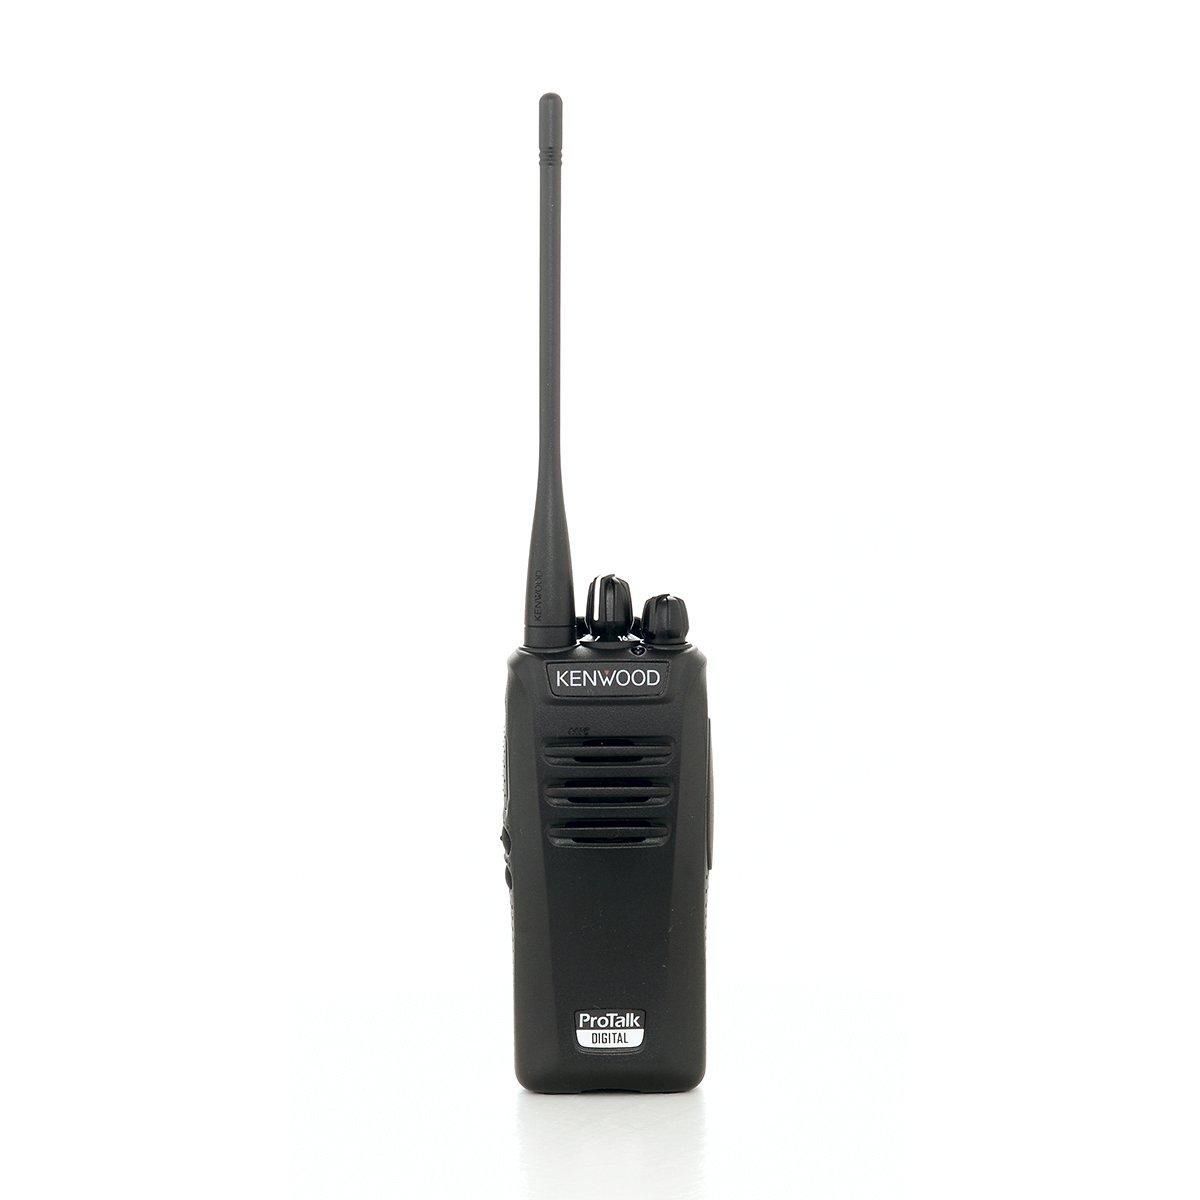 Kenwood NX-340U16P2 Two Watt Digital UHF Nexedge Professional Business Radio, Black